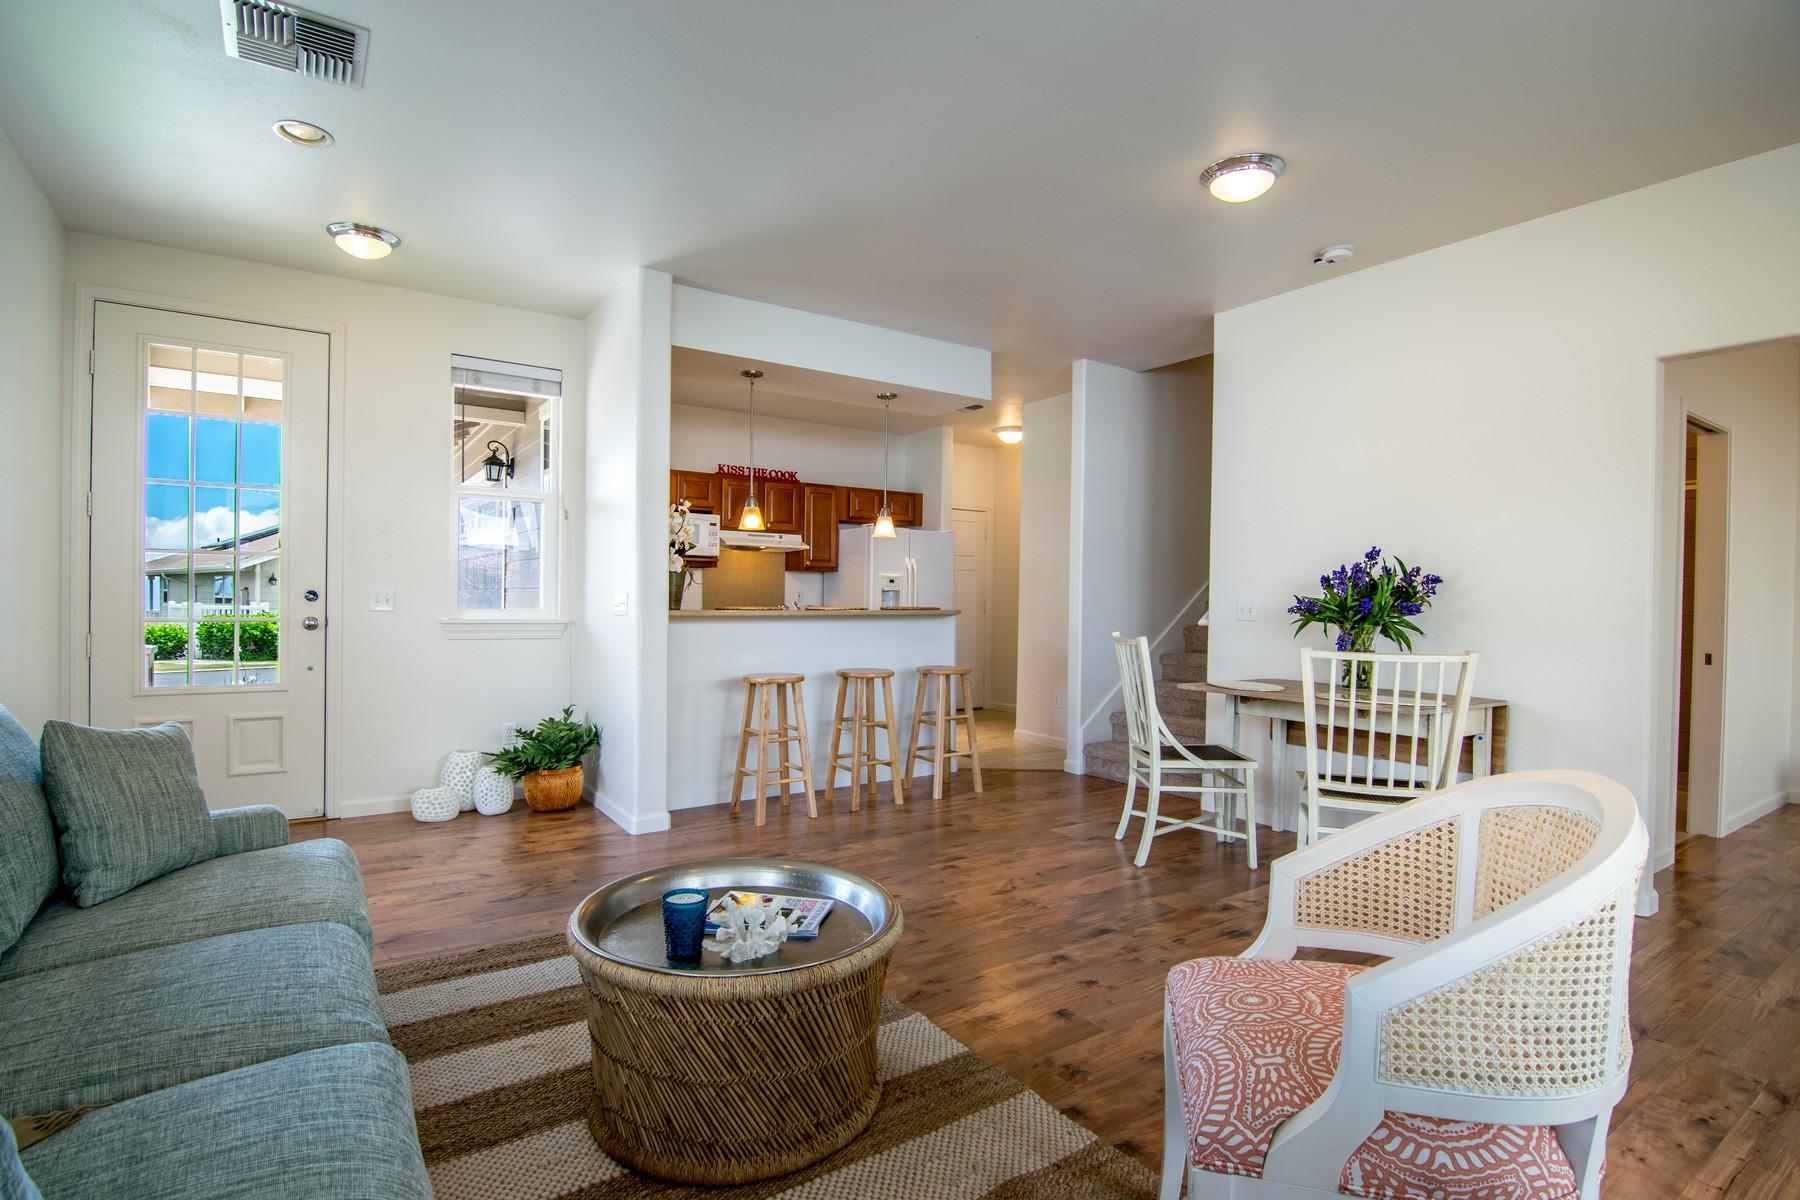 Nhà phố vì Bán tại 4 Bedroom, 3 Baths View Home for $685,000 46 Kuinehe Place, The Cottages at Kulamalu 18 Pukalani, Hawaii, 96768 Hoa Kỳ